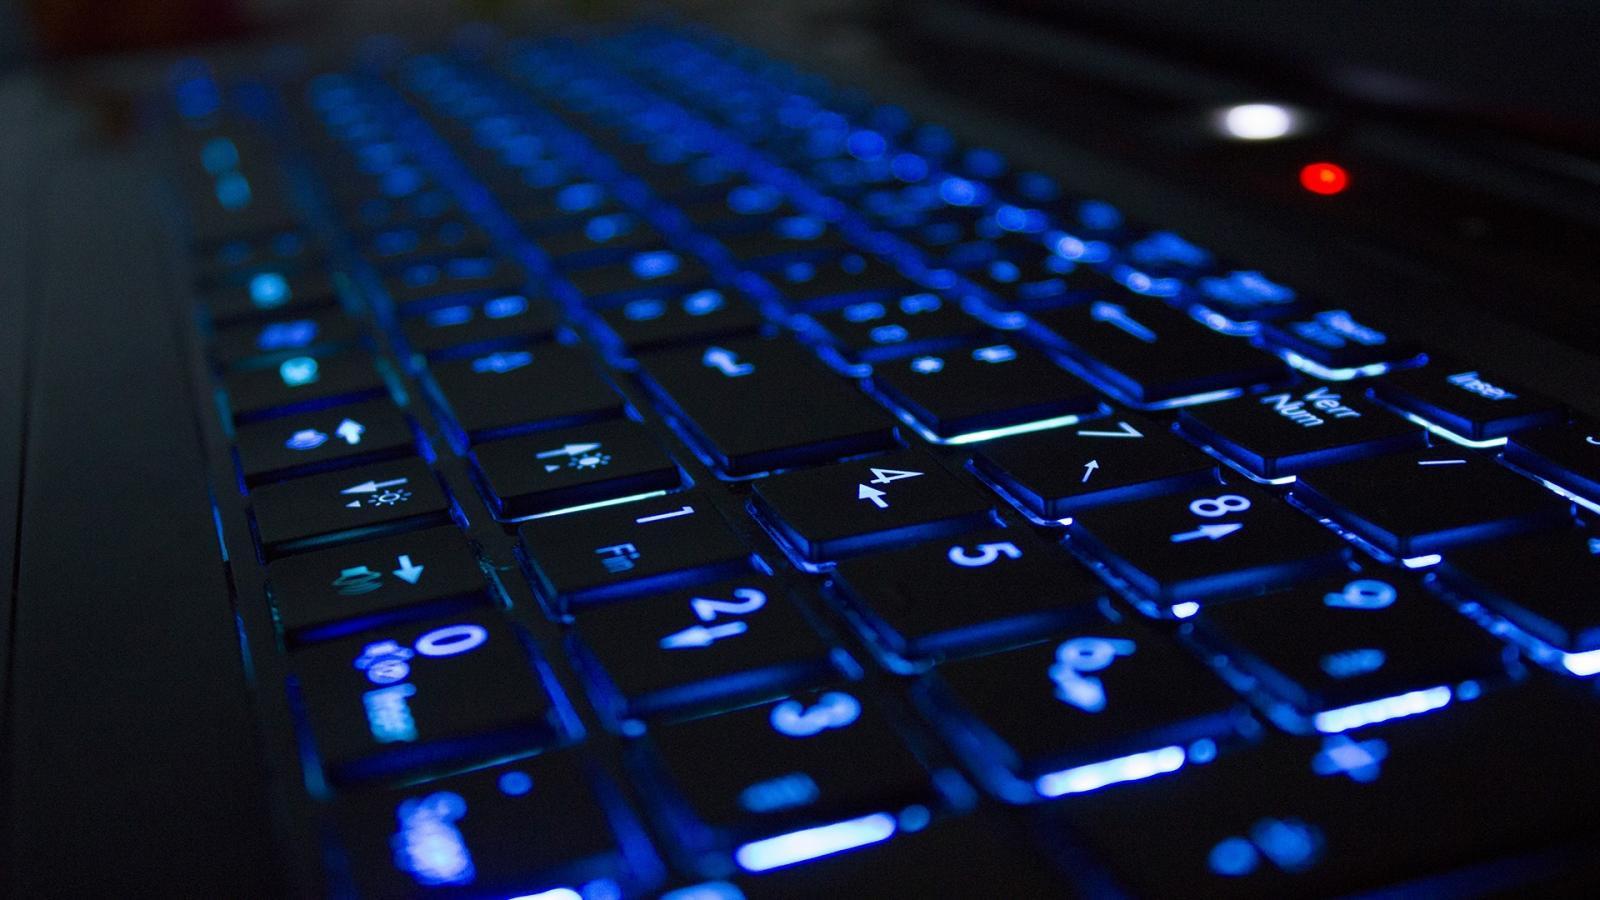 msi razer keyboards computers lights wallpapersafari code